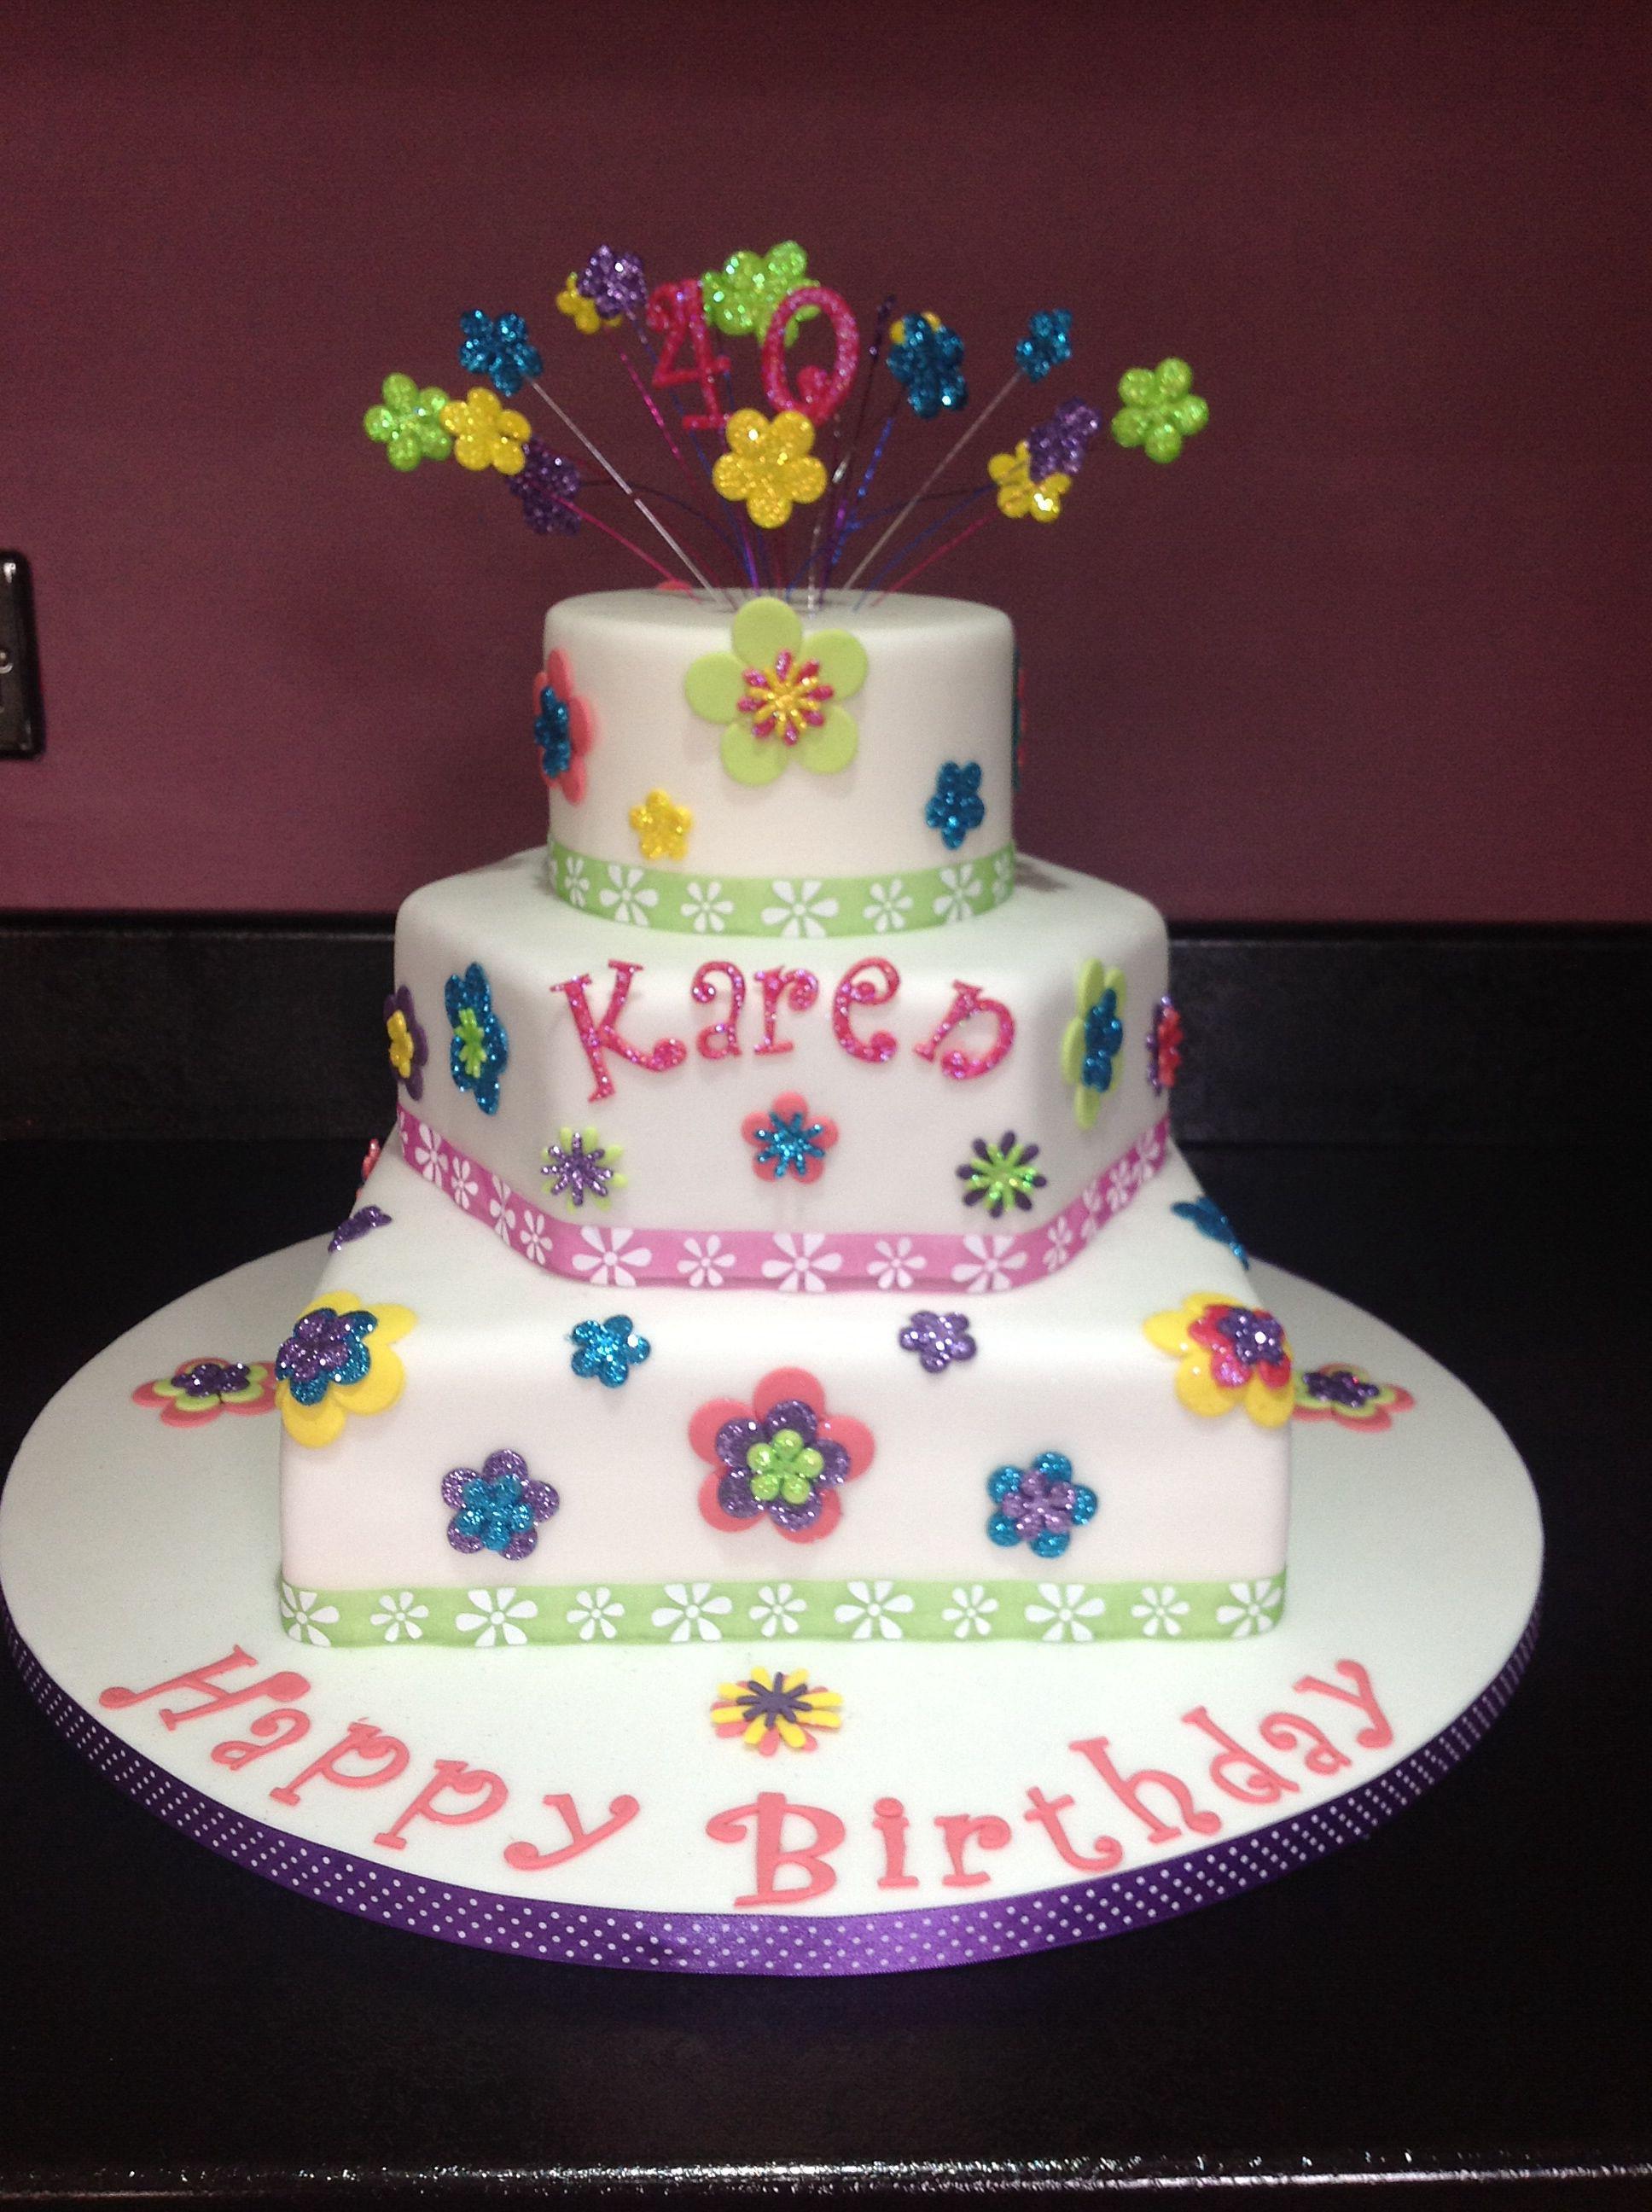 40th birthday cake | 40th birthday cakes, Cake, Cake ...